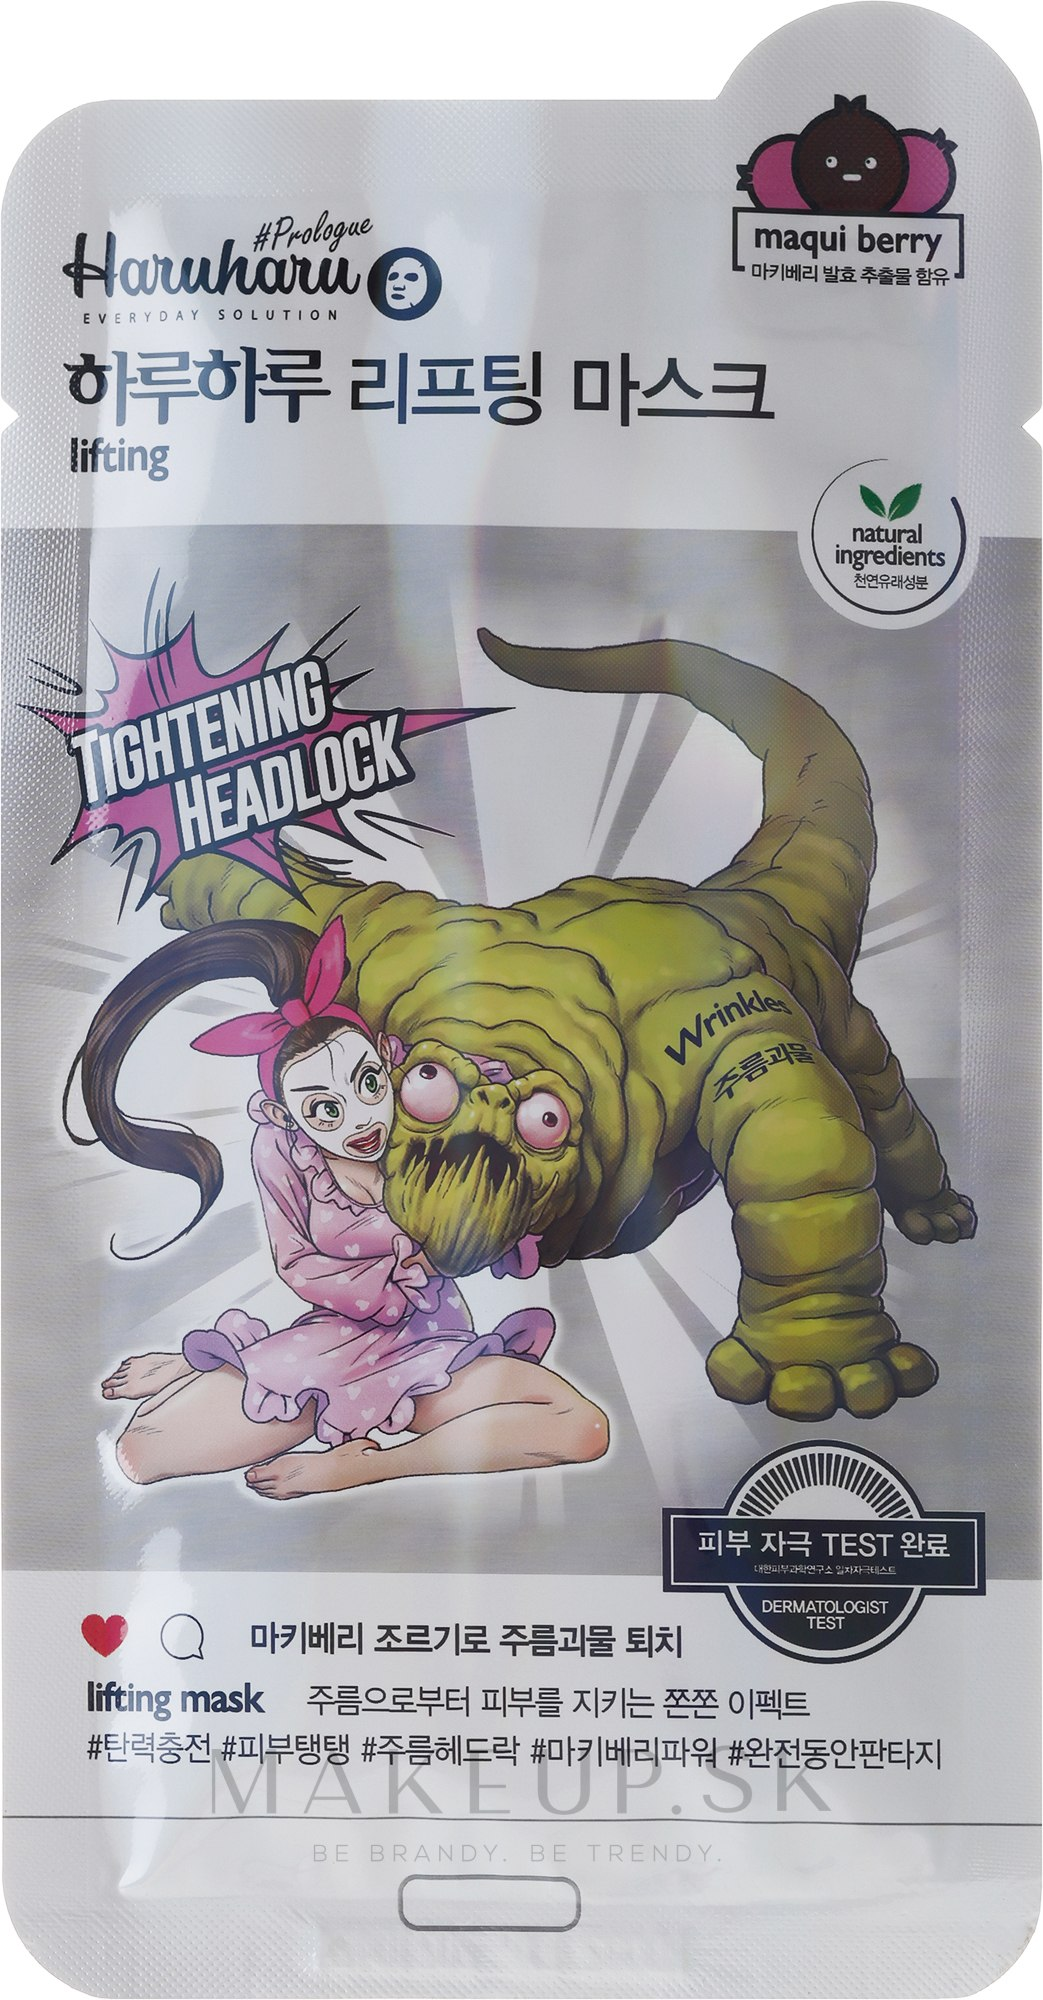 Lifting-maska na tvár - Haruharu Prologue Maqui Berry Lifting Mask — Obrázky 25 ml